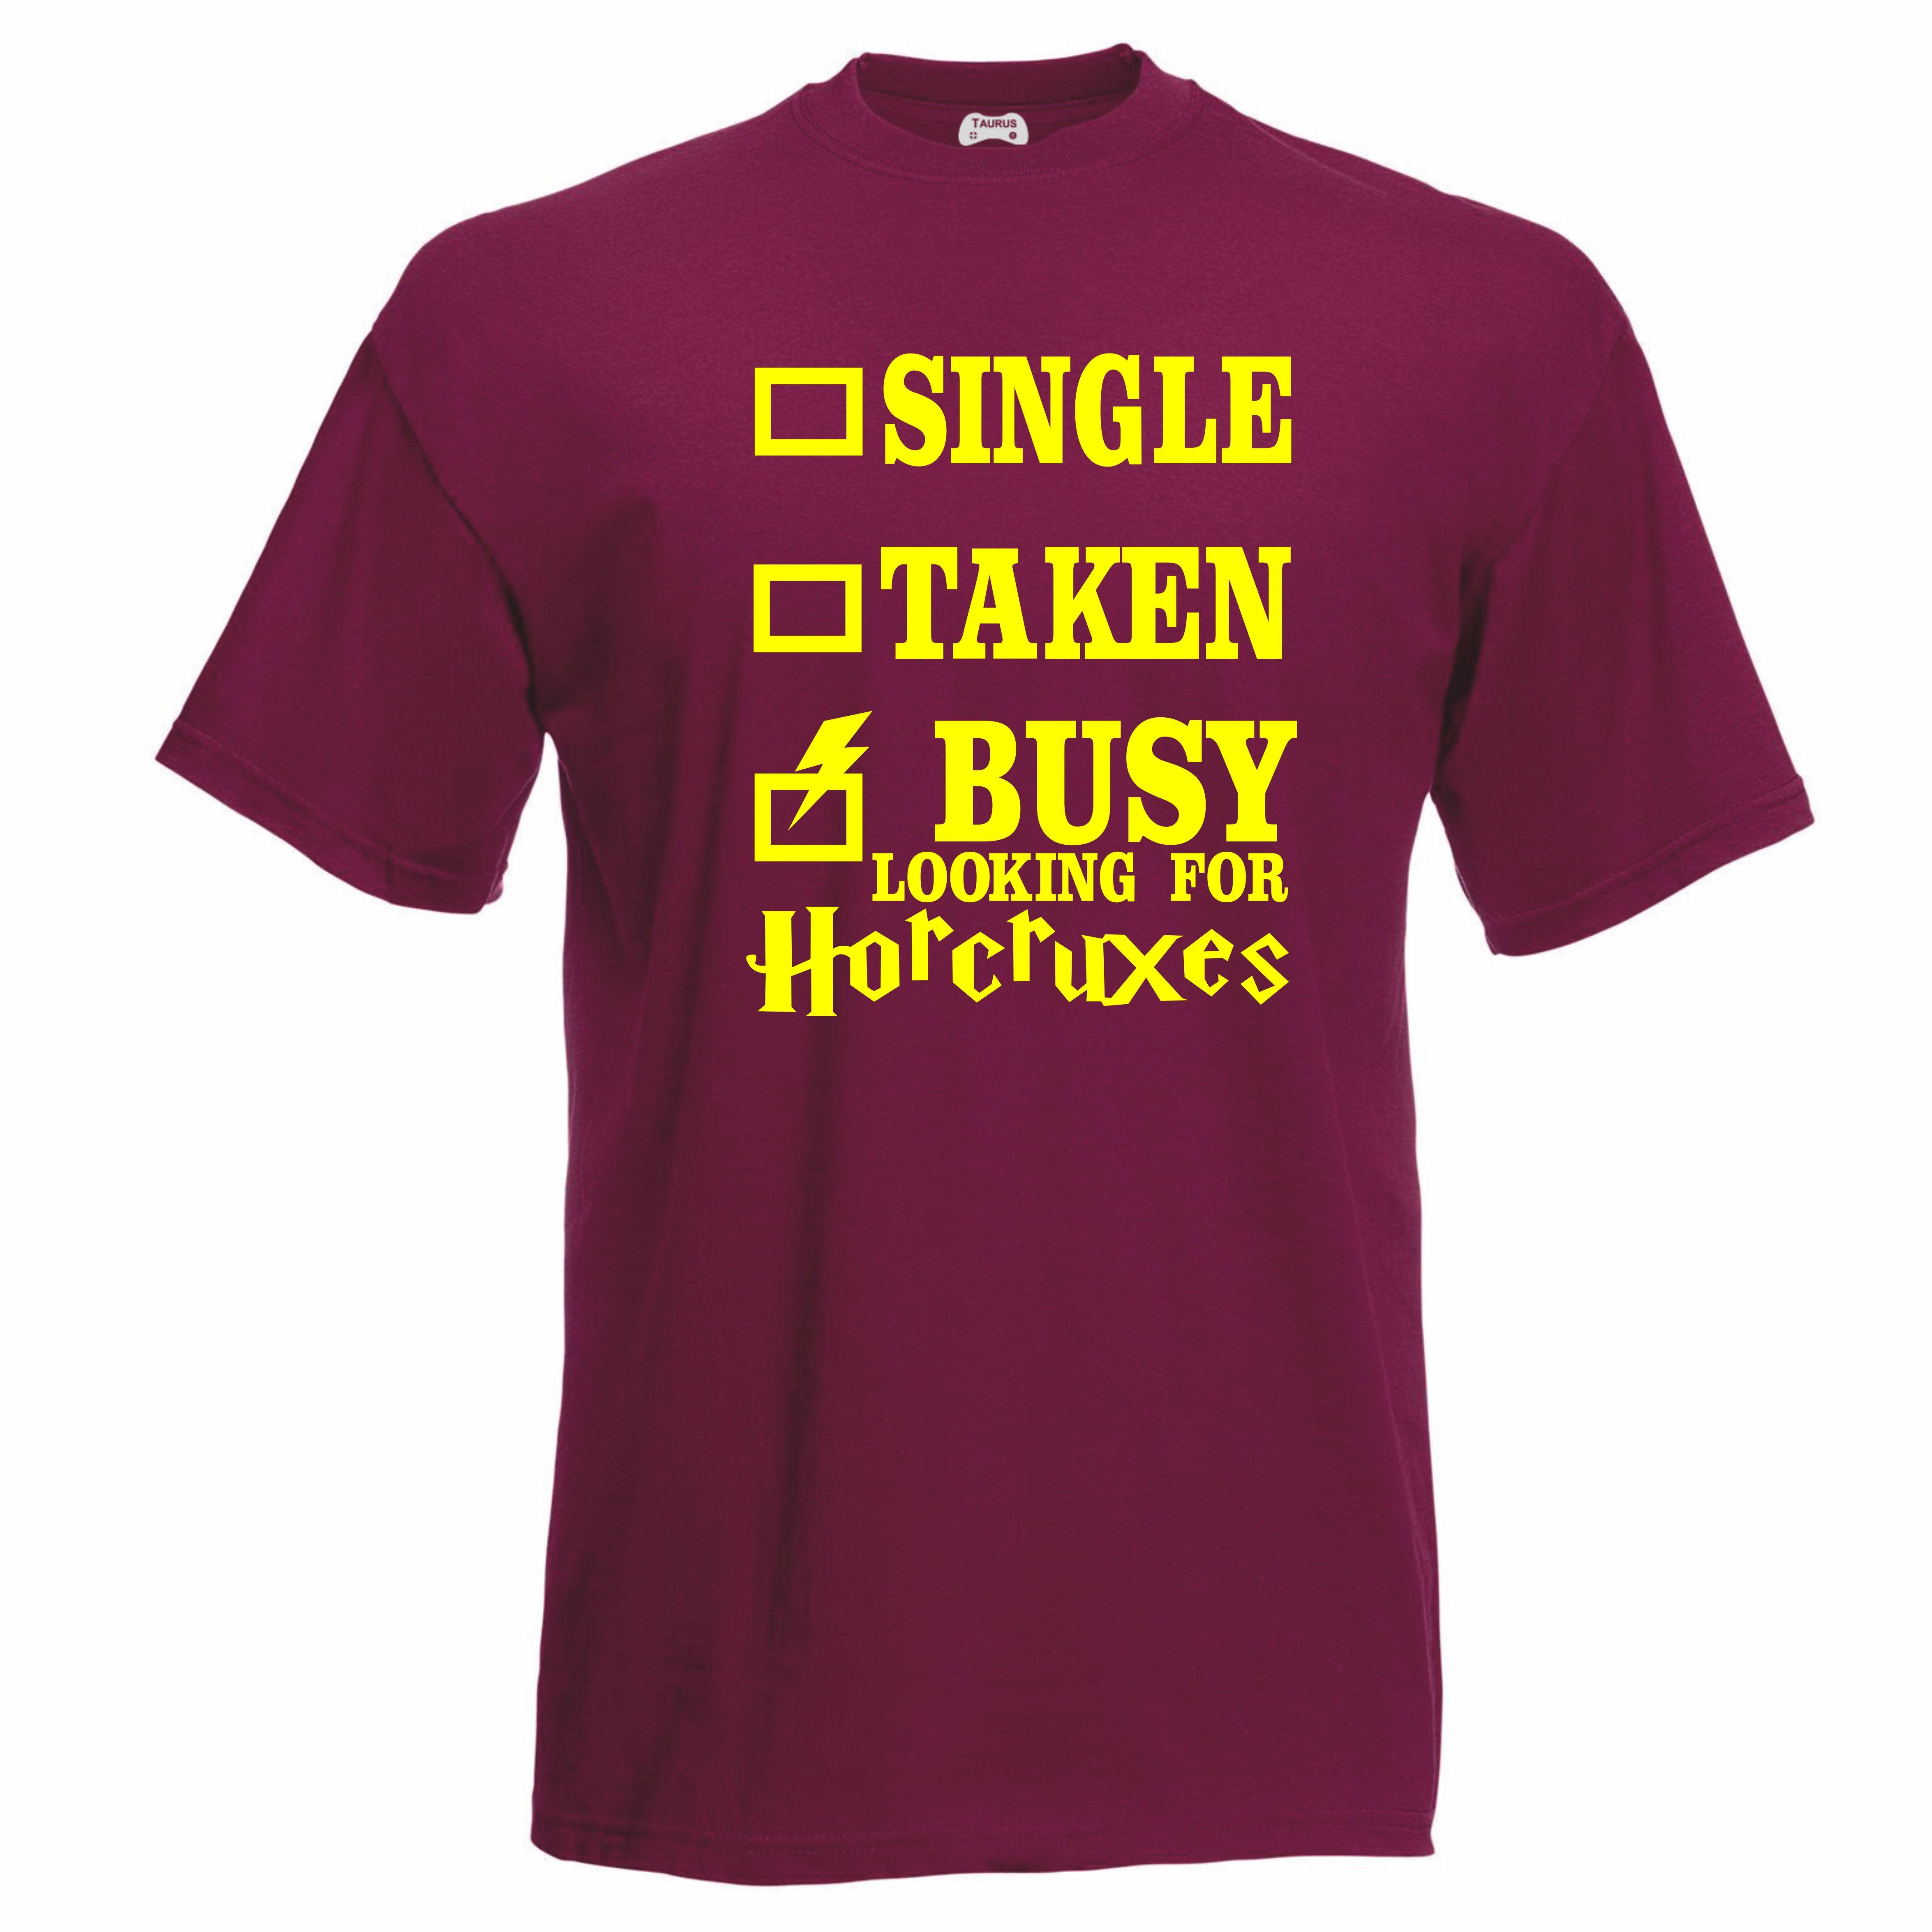 Harry Potter T-Shirt Horocrux